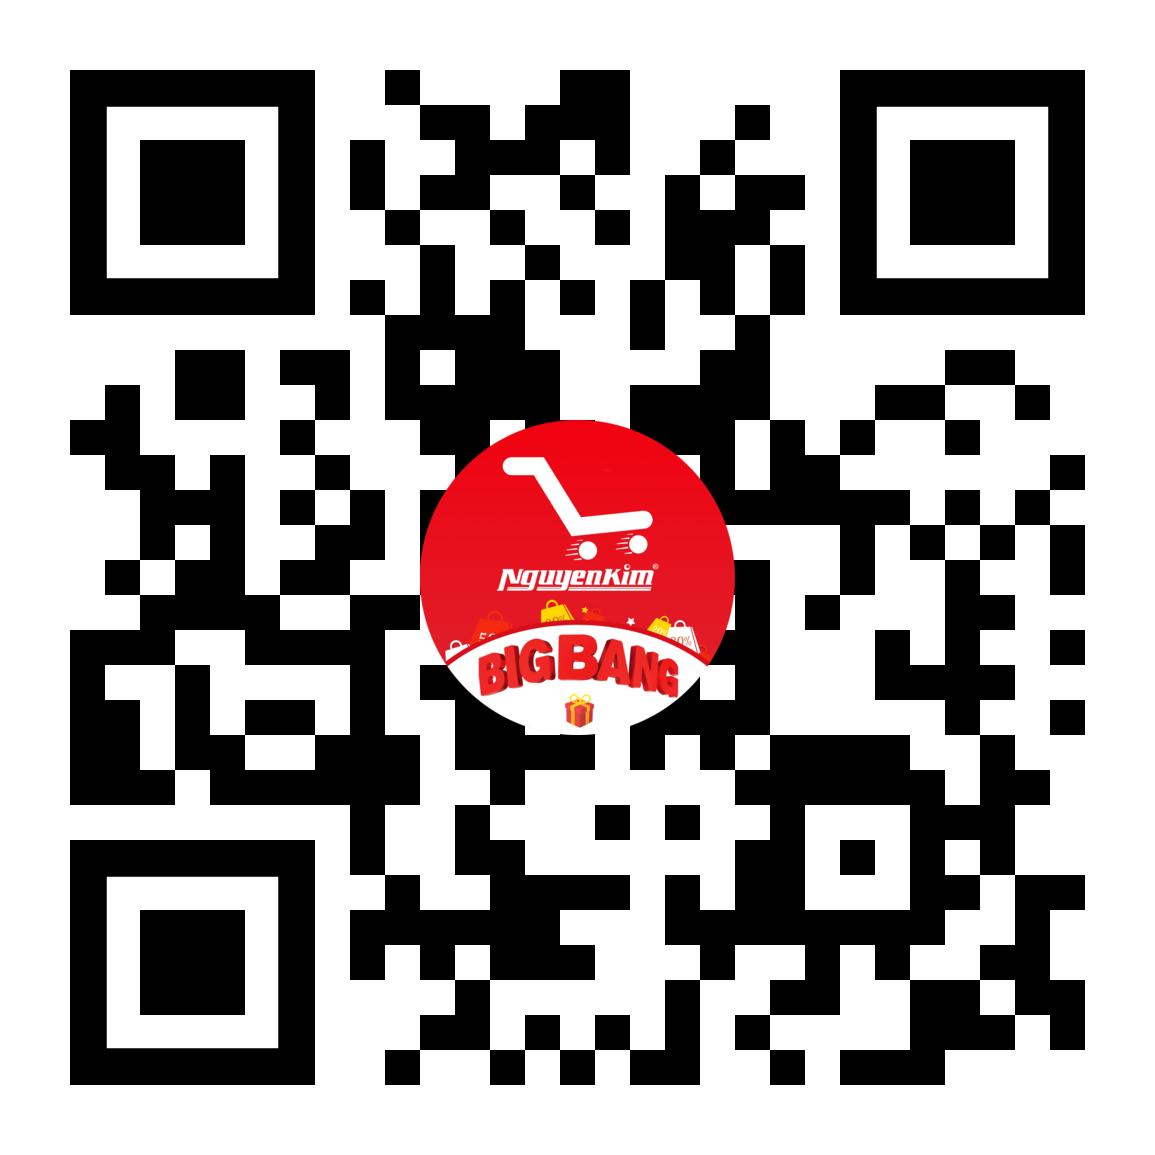 bigbang qr-code